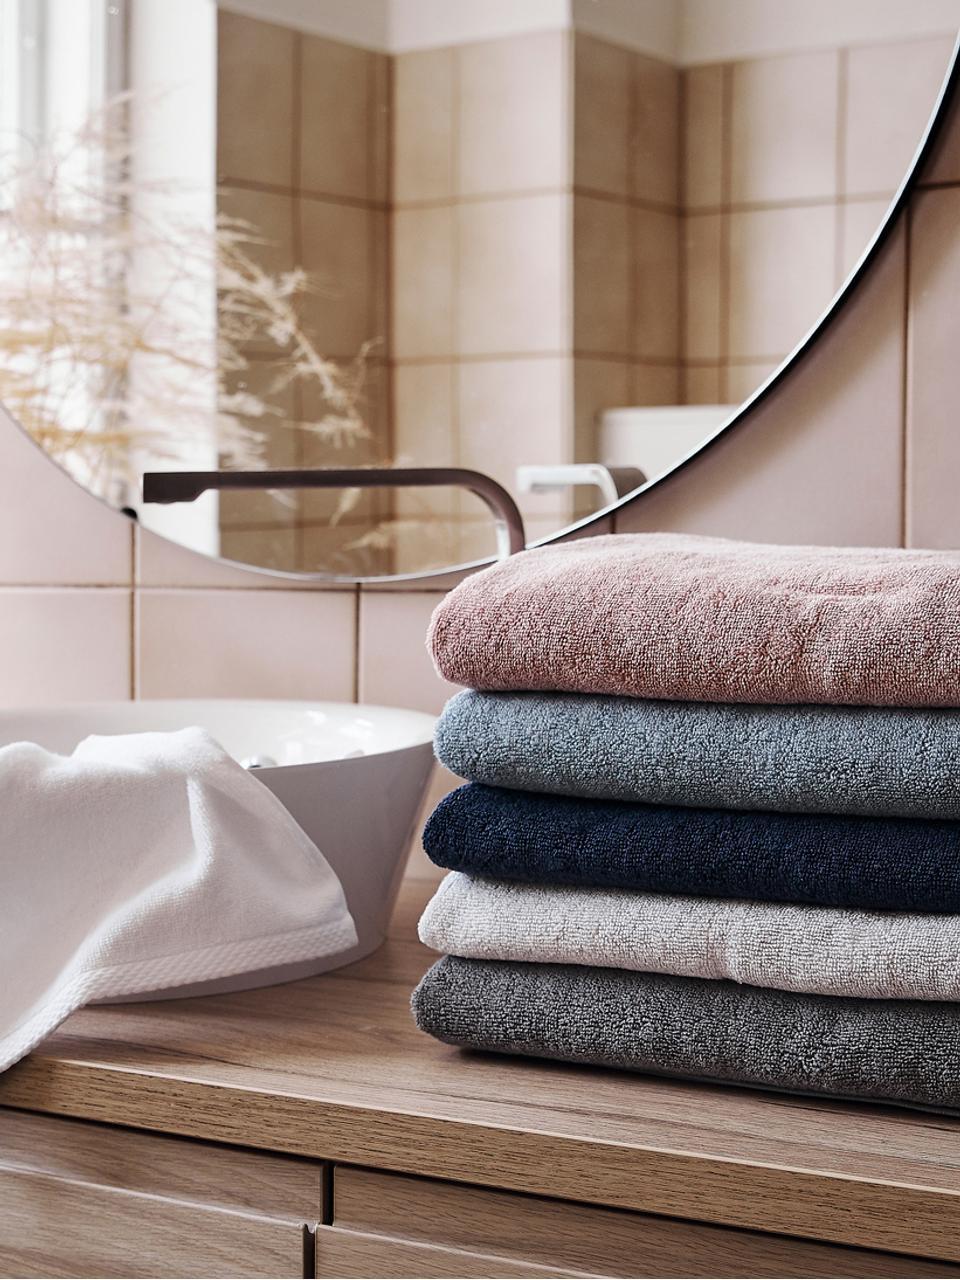 Set de toallas Comfort, 3pzas., Azul oscuro, Set de diferentes tamaños